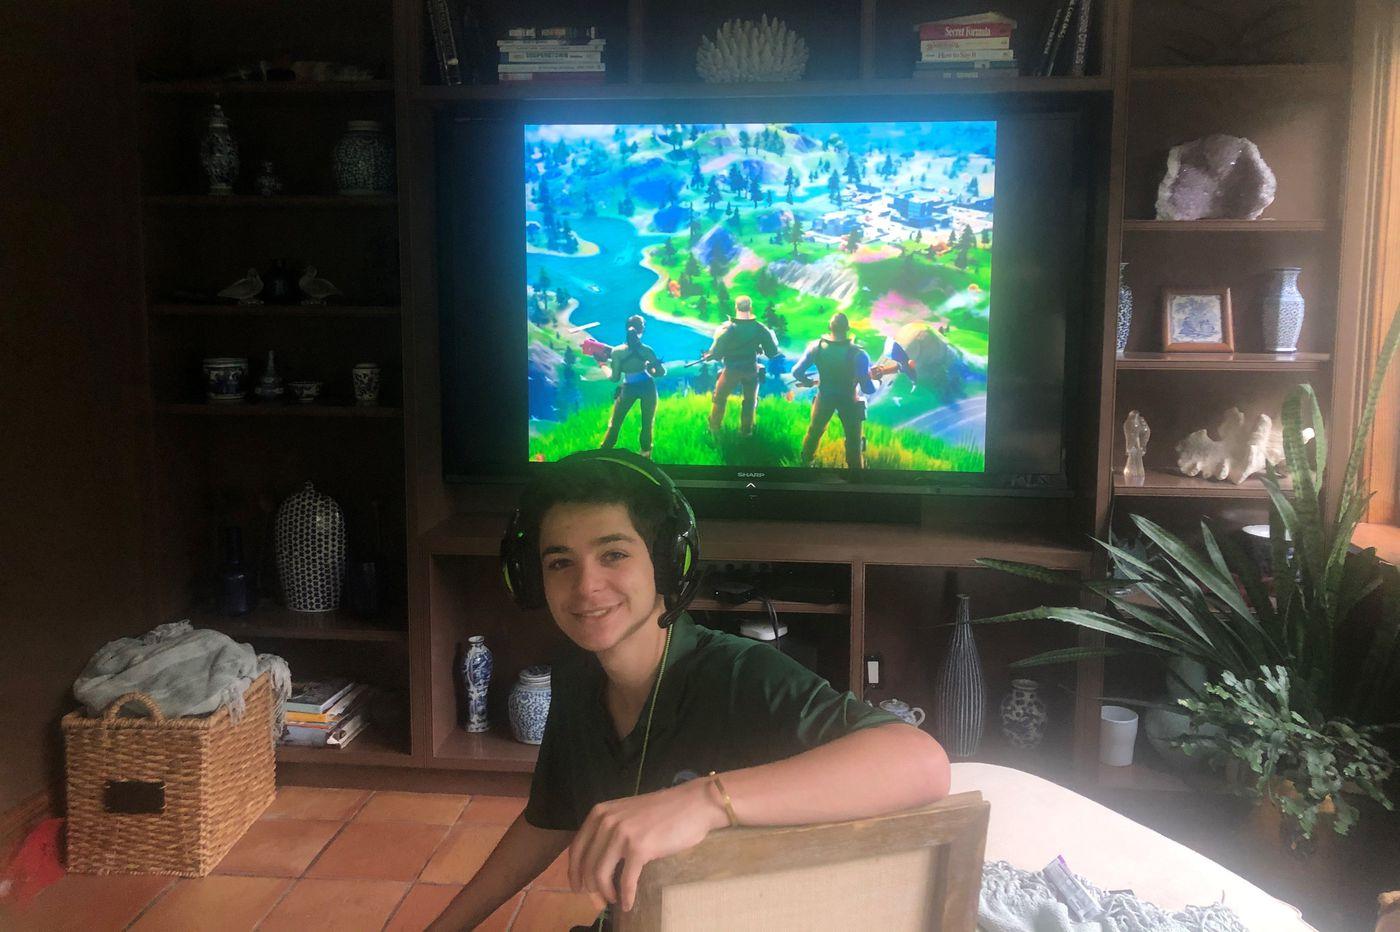 Shipley students plan Fortnite video game marathon to raise money for nurses